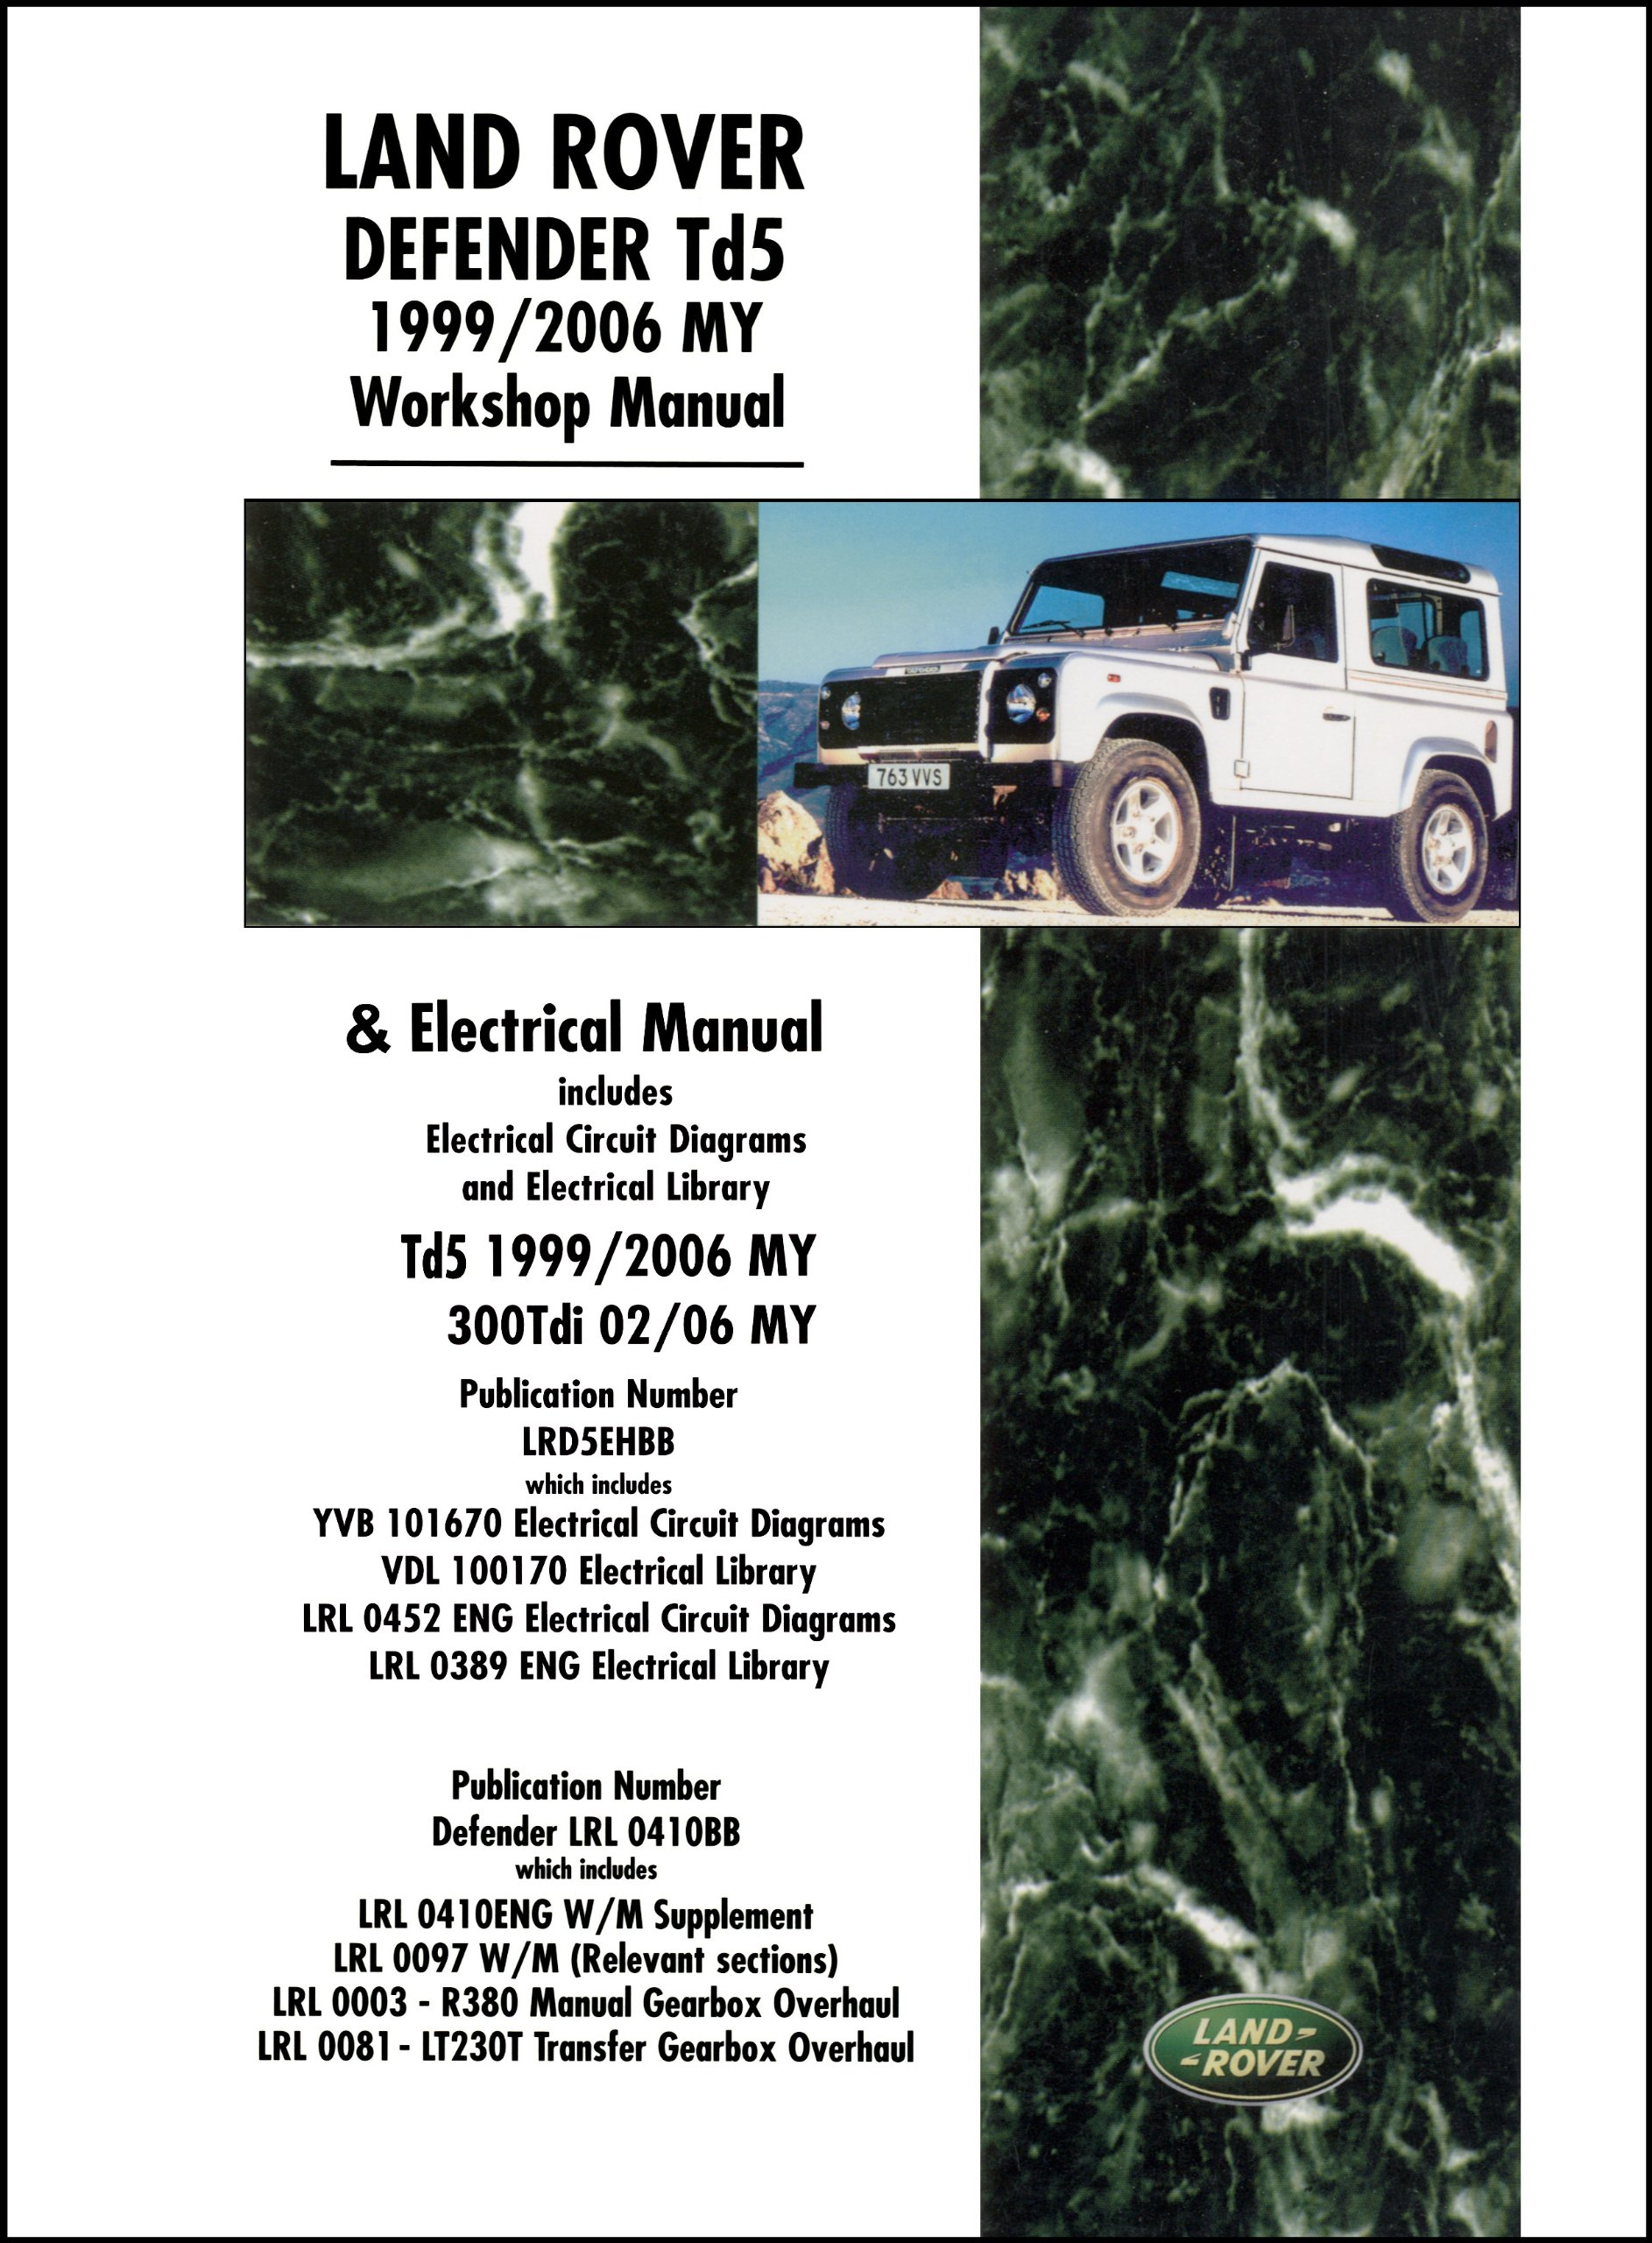 Land Rover Defender Td5 Workshop & Electrical Manual 1999-2006 (Official Land  Rover Manual) (Motor Books): Amazon.co.uk: Land Rover Ltd: 9781855207158:  ...